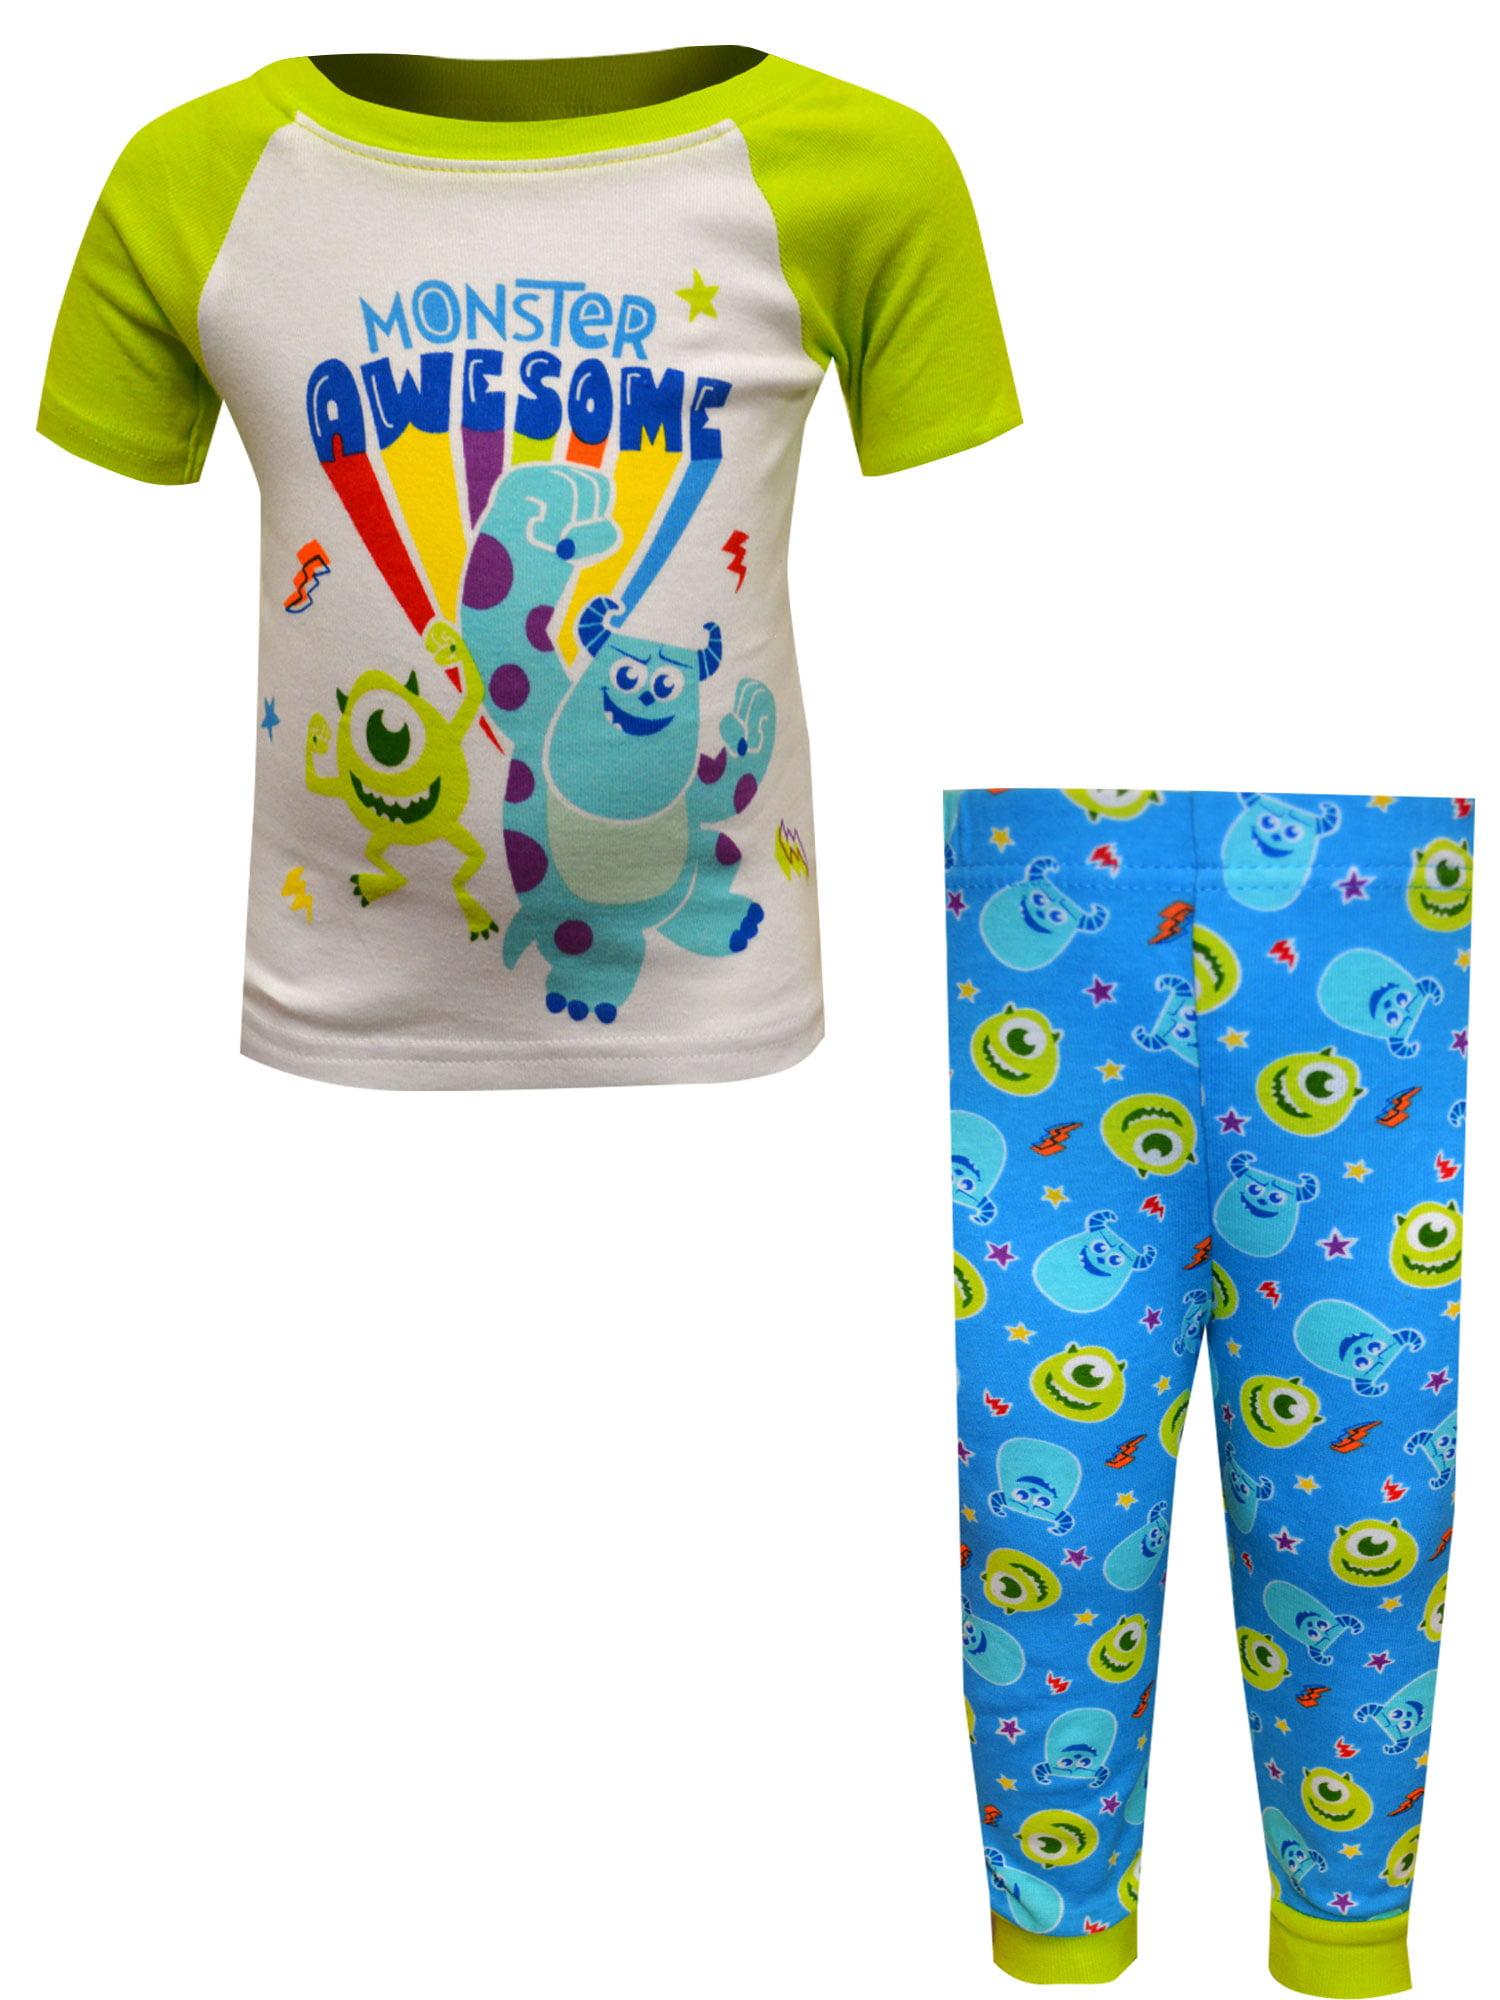 Ame Sleepwear Ame Sleepwear Boys Disney Baby Monsters University Cotton Infant Pajama 24 Mo Walmart Com Walmart Com